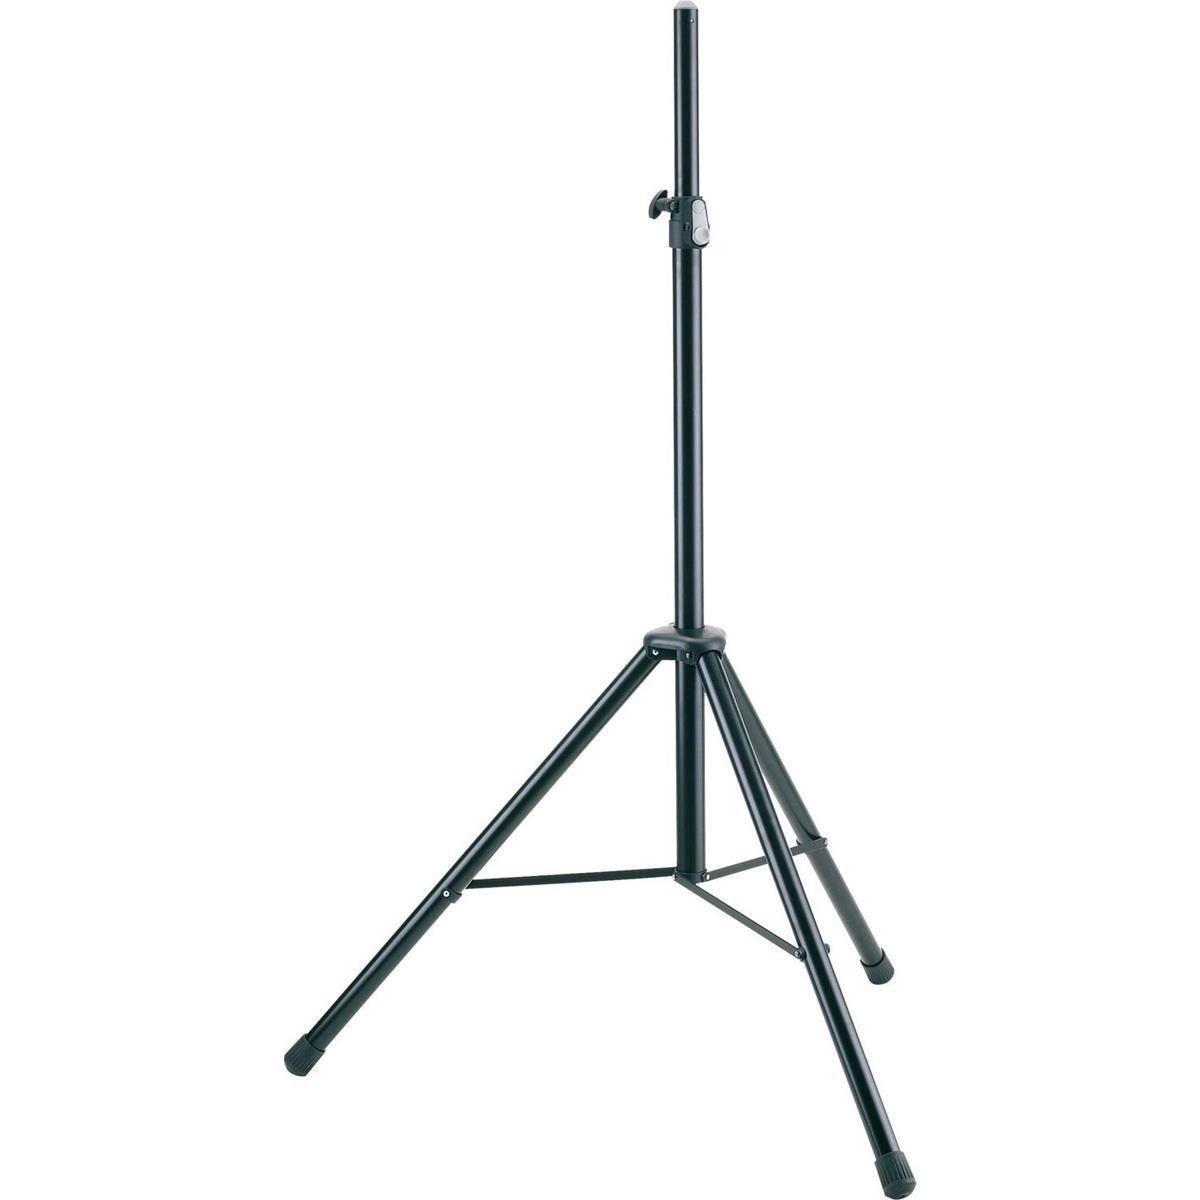 K Amp M Speaker Stand 4 6 Feet To 7 3 Feet